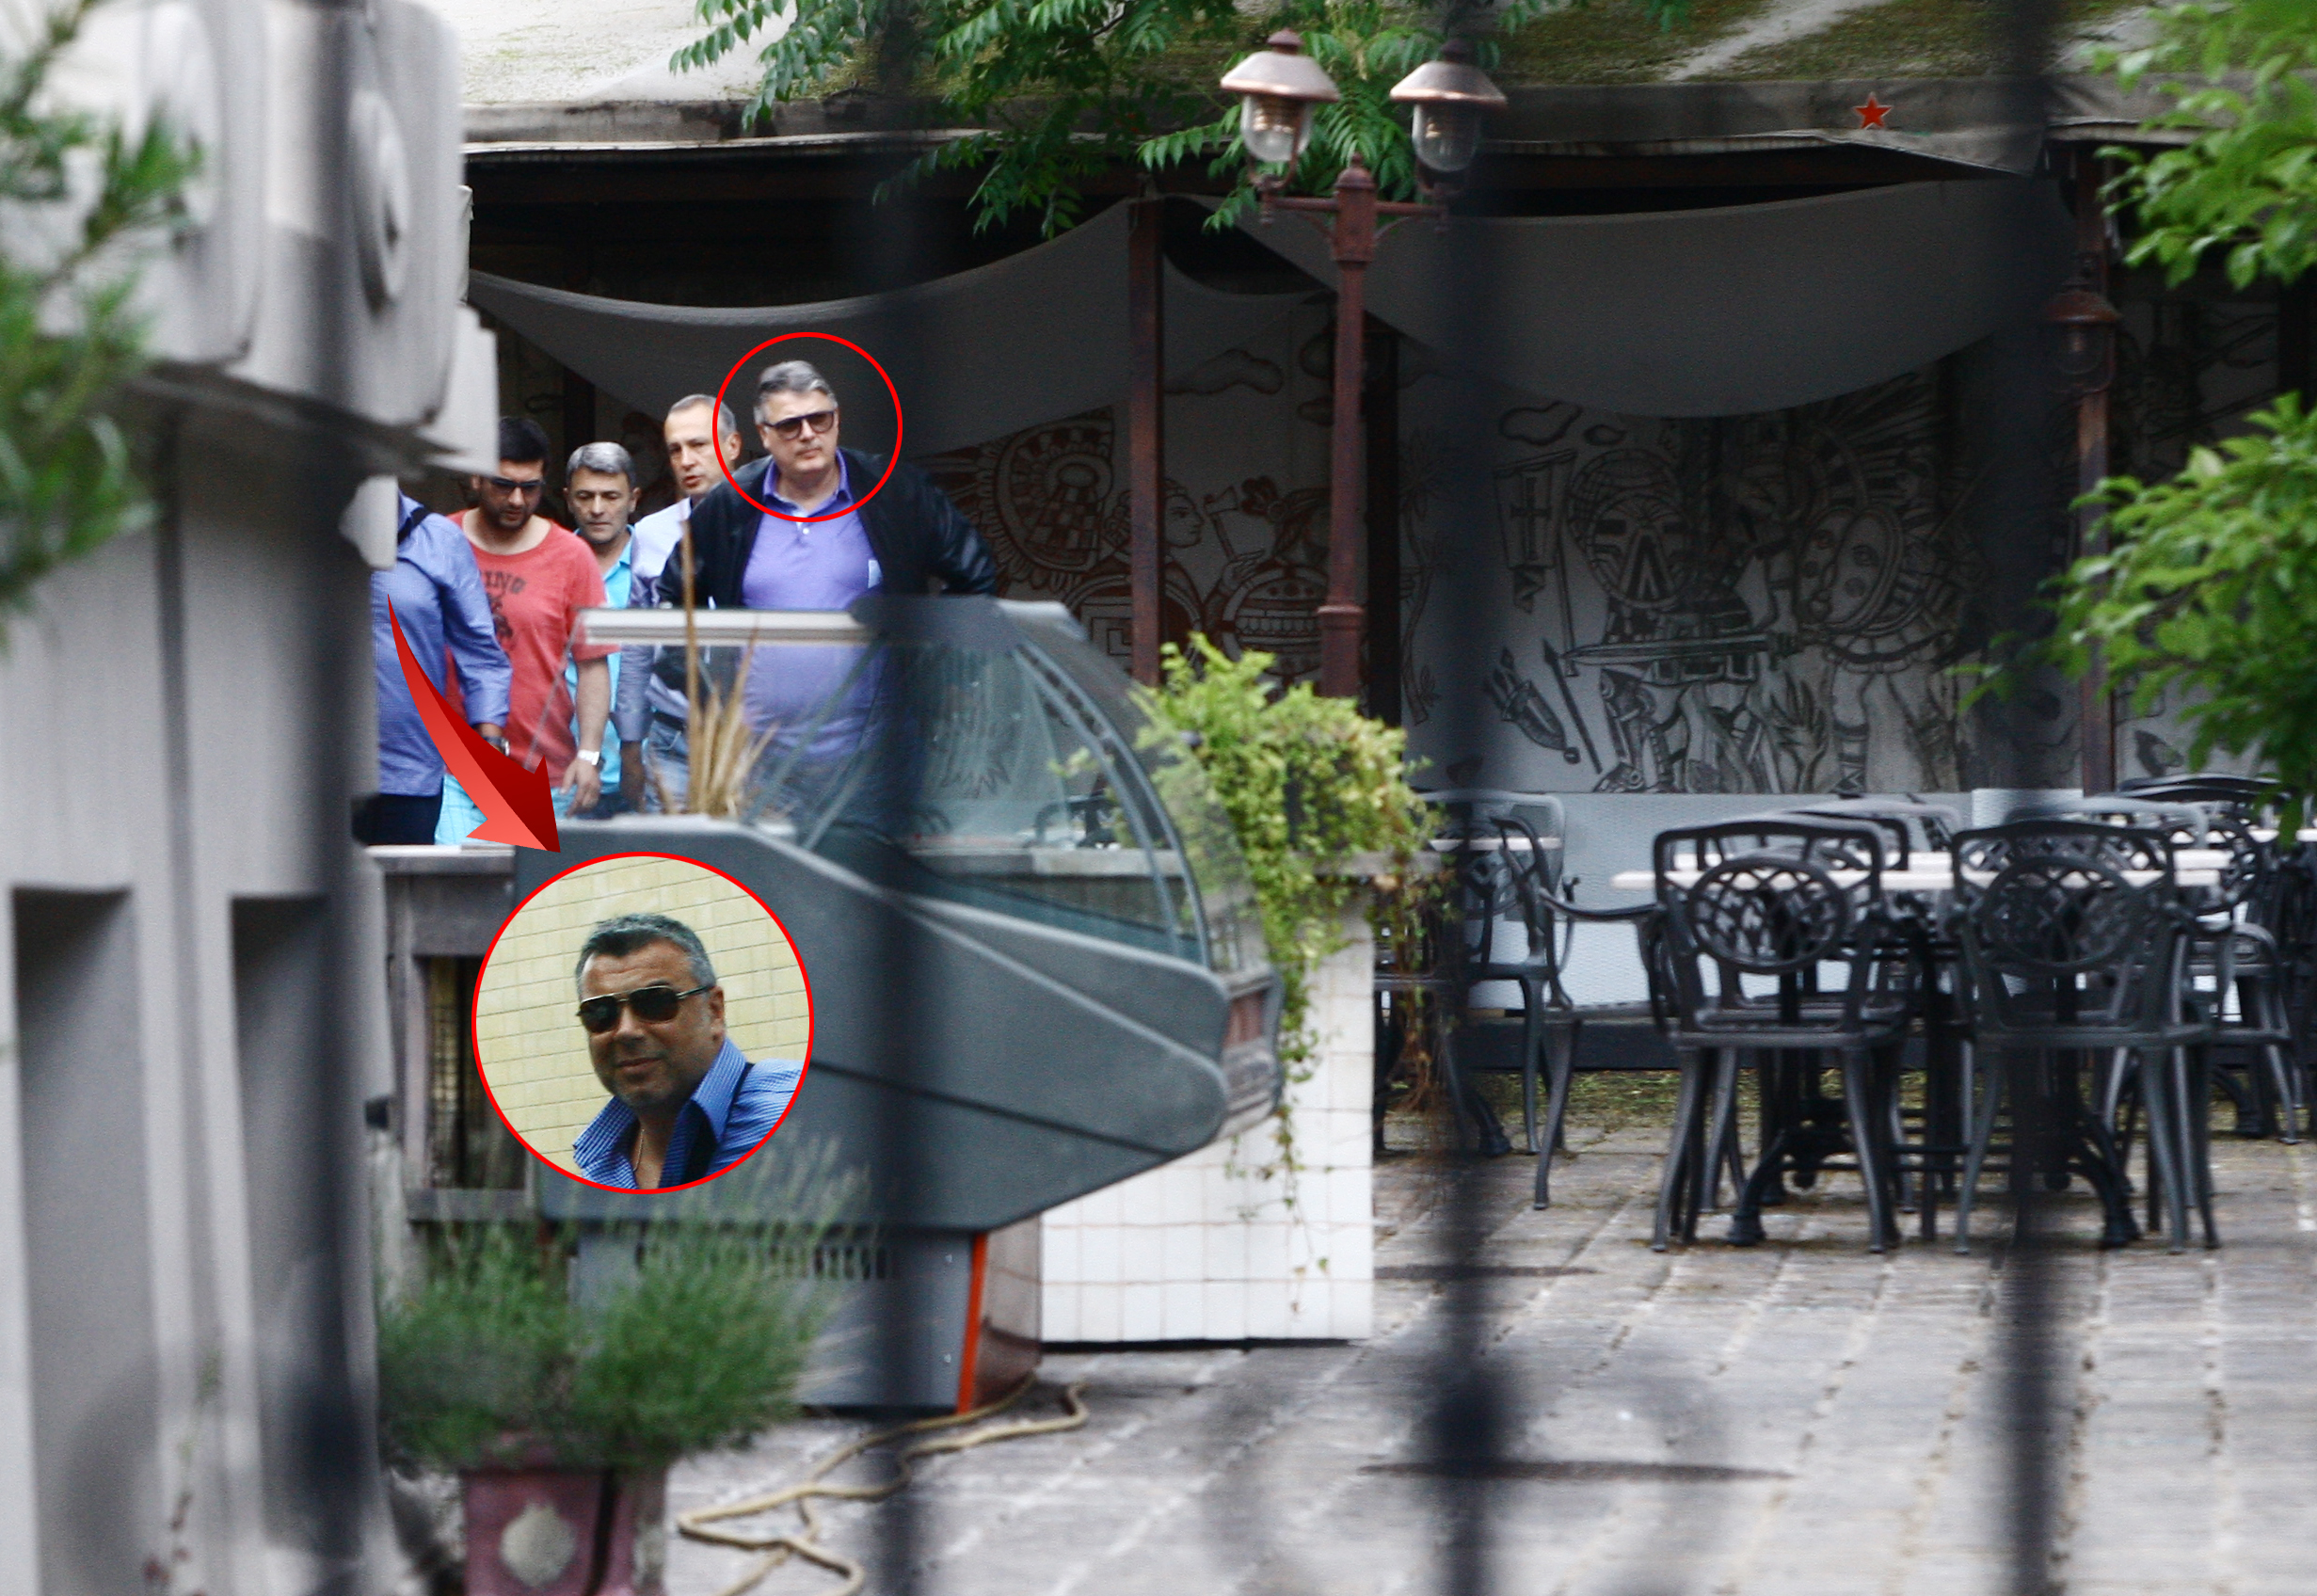 Tandemul Olaroiu-Iorgulescu a inspectat vila si curtea aproape 30 de minute, insa nu au fost impresionati